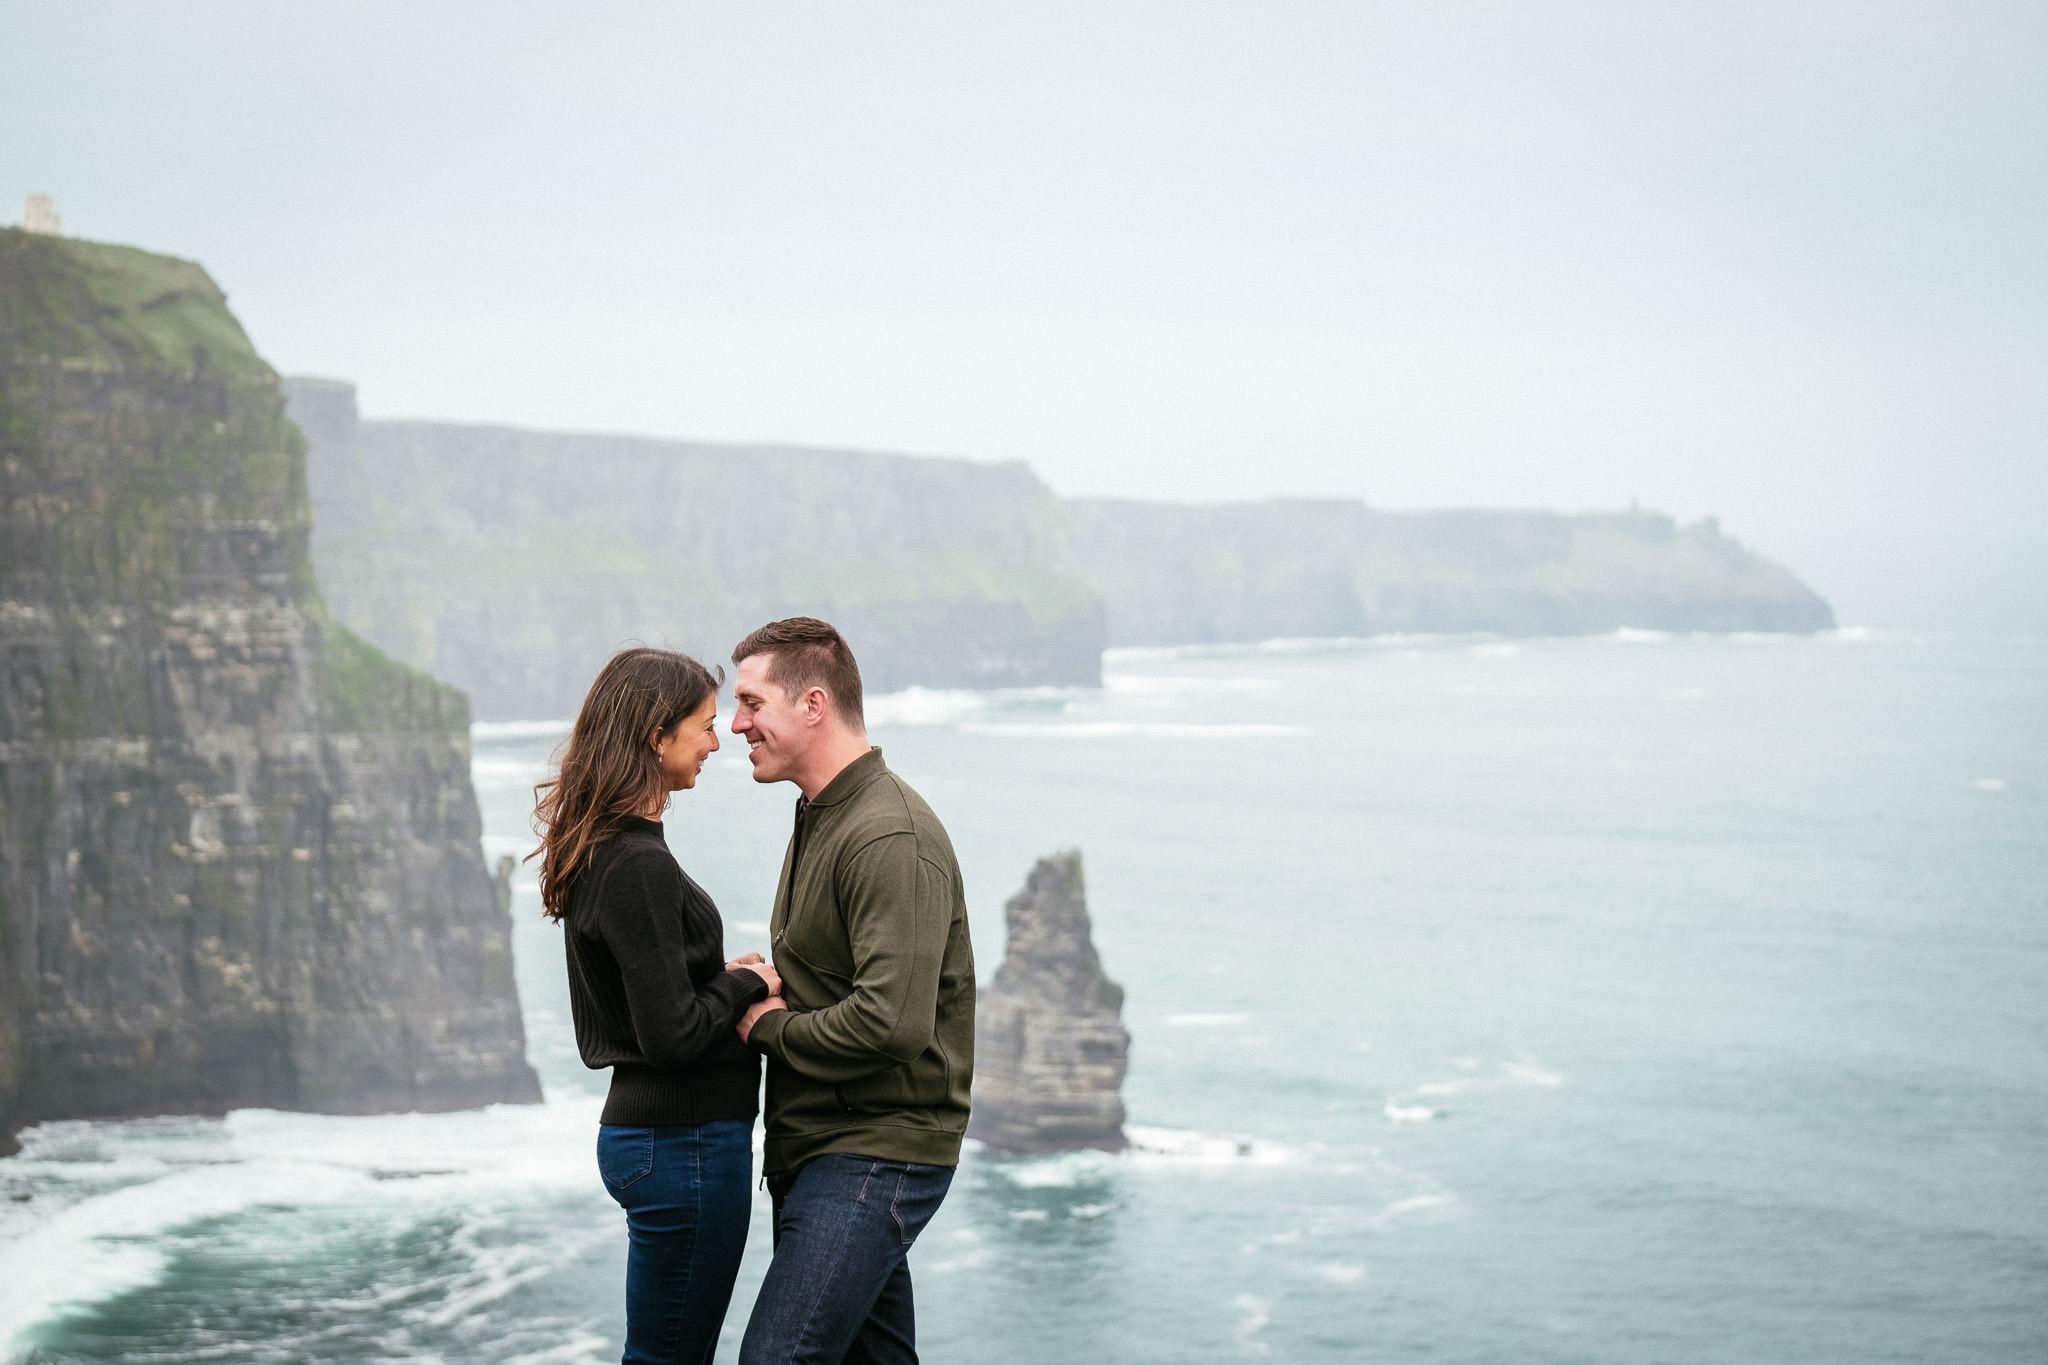 elopement Photographer ireland 2